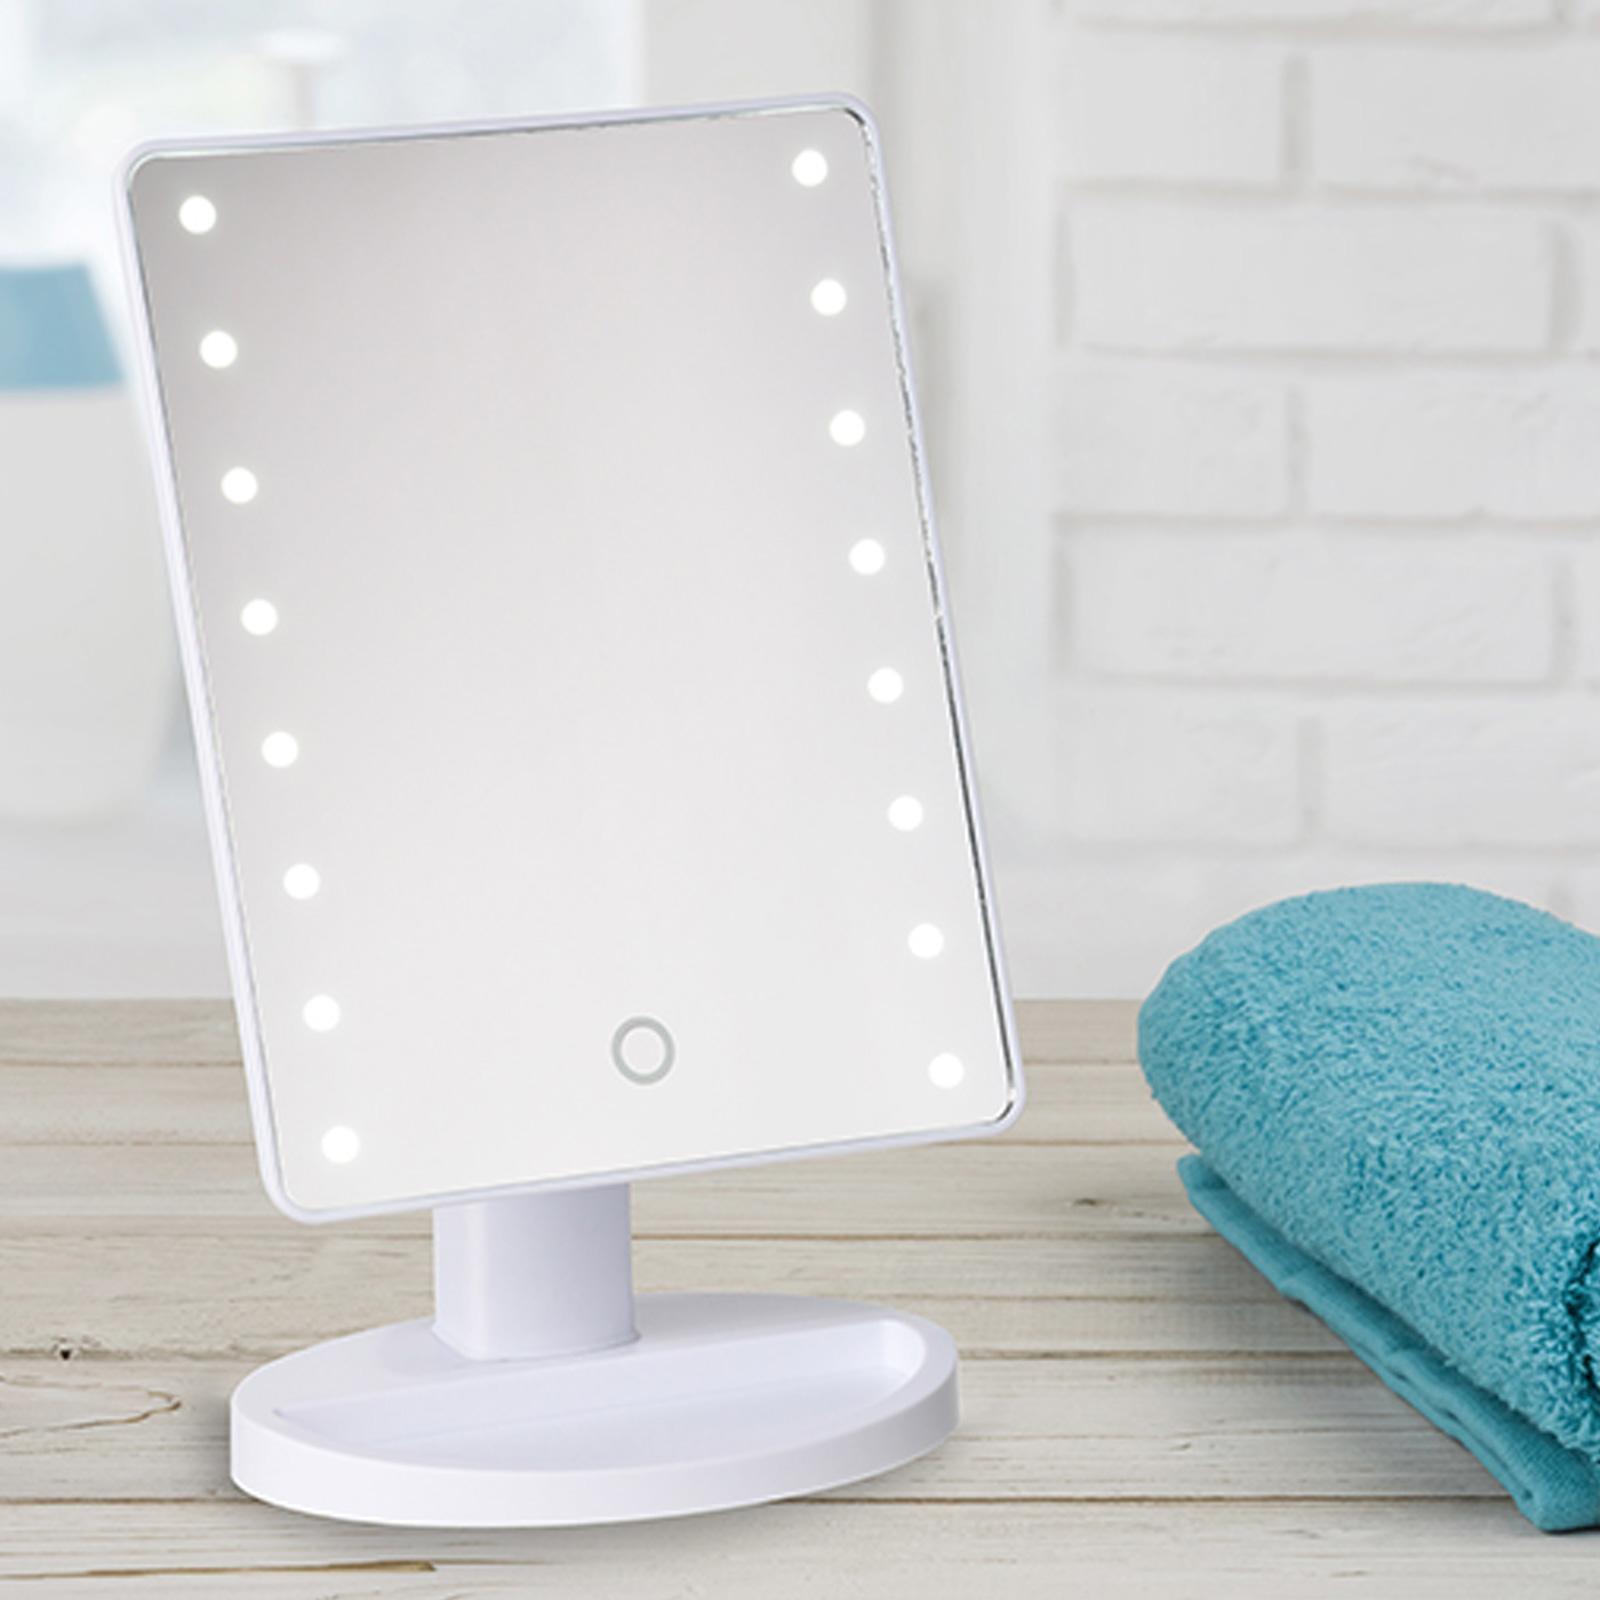 led kosmetikspiegel stand spiegel beleuchtet tischspiegel. Black Bedroom Furniture Sets. Home Design Ideas